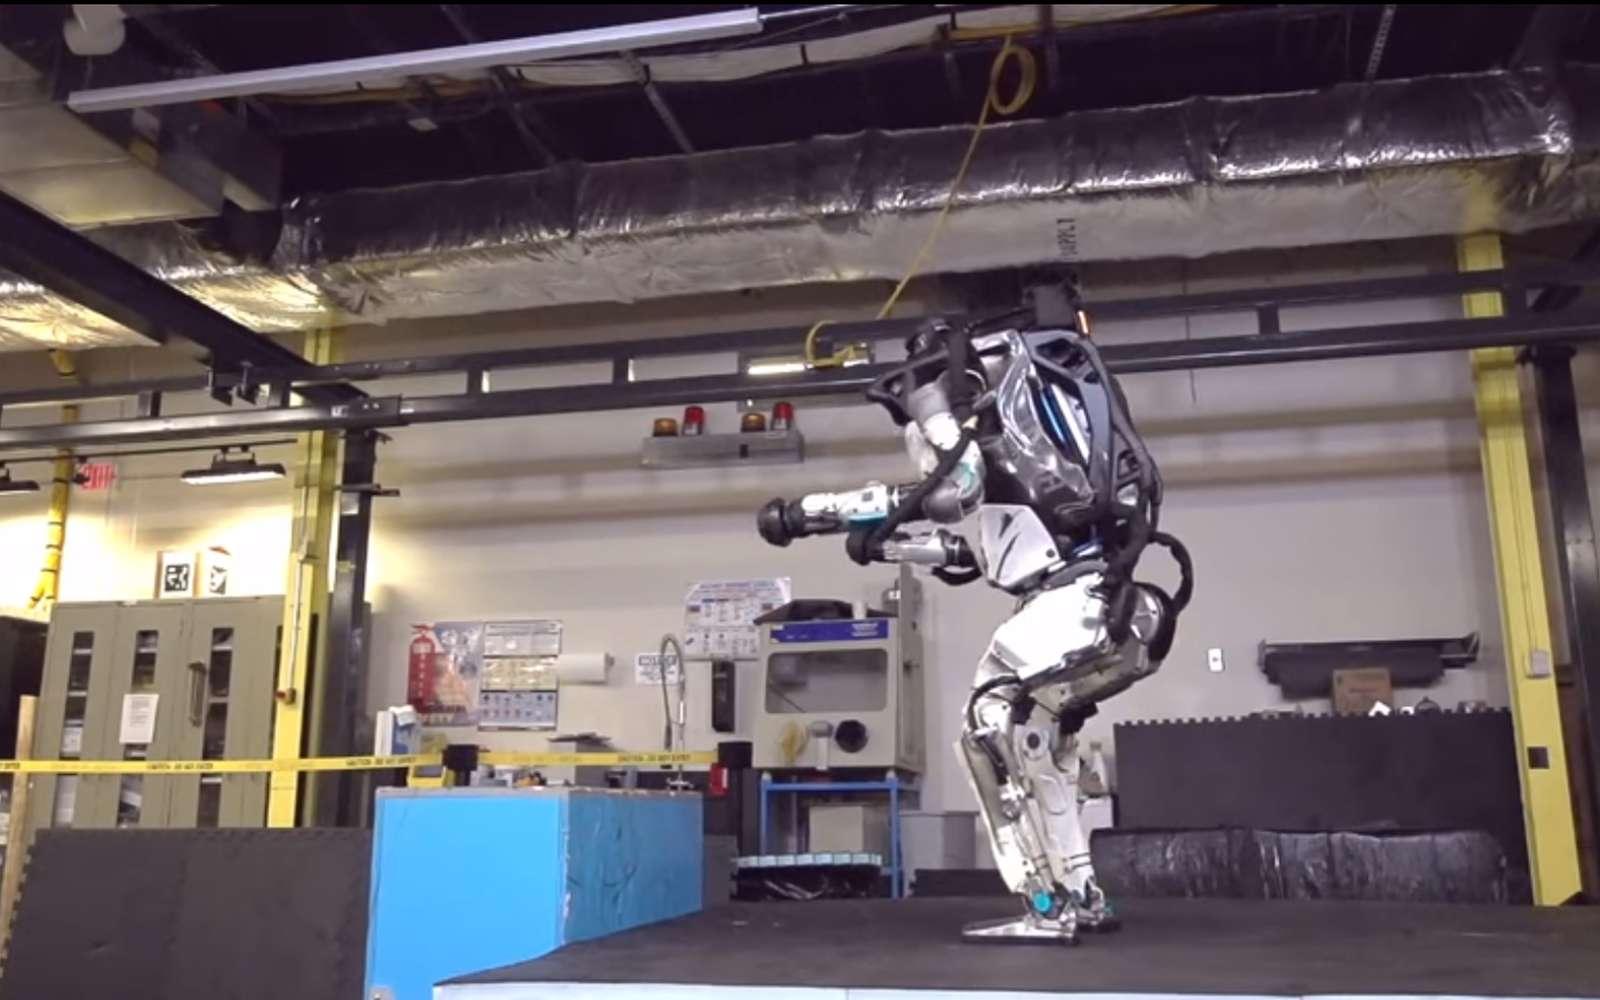 Le robot bipède Altas en plein salto arrière. © Boston Dynamics